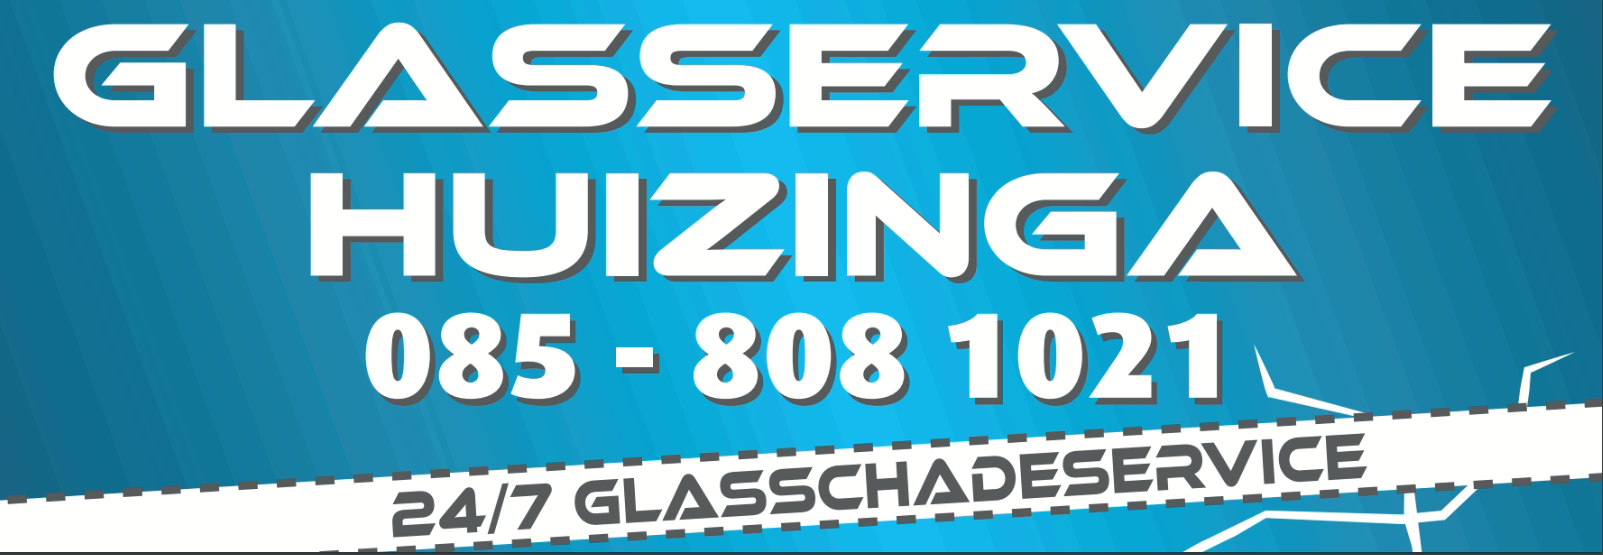 Glasservice Huizinga